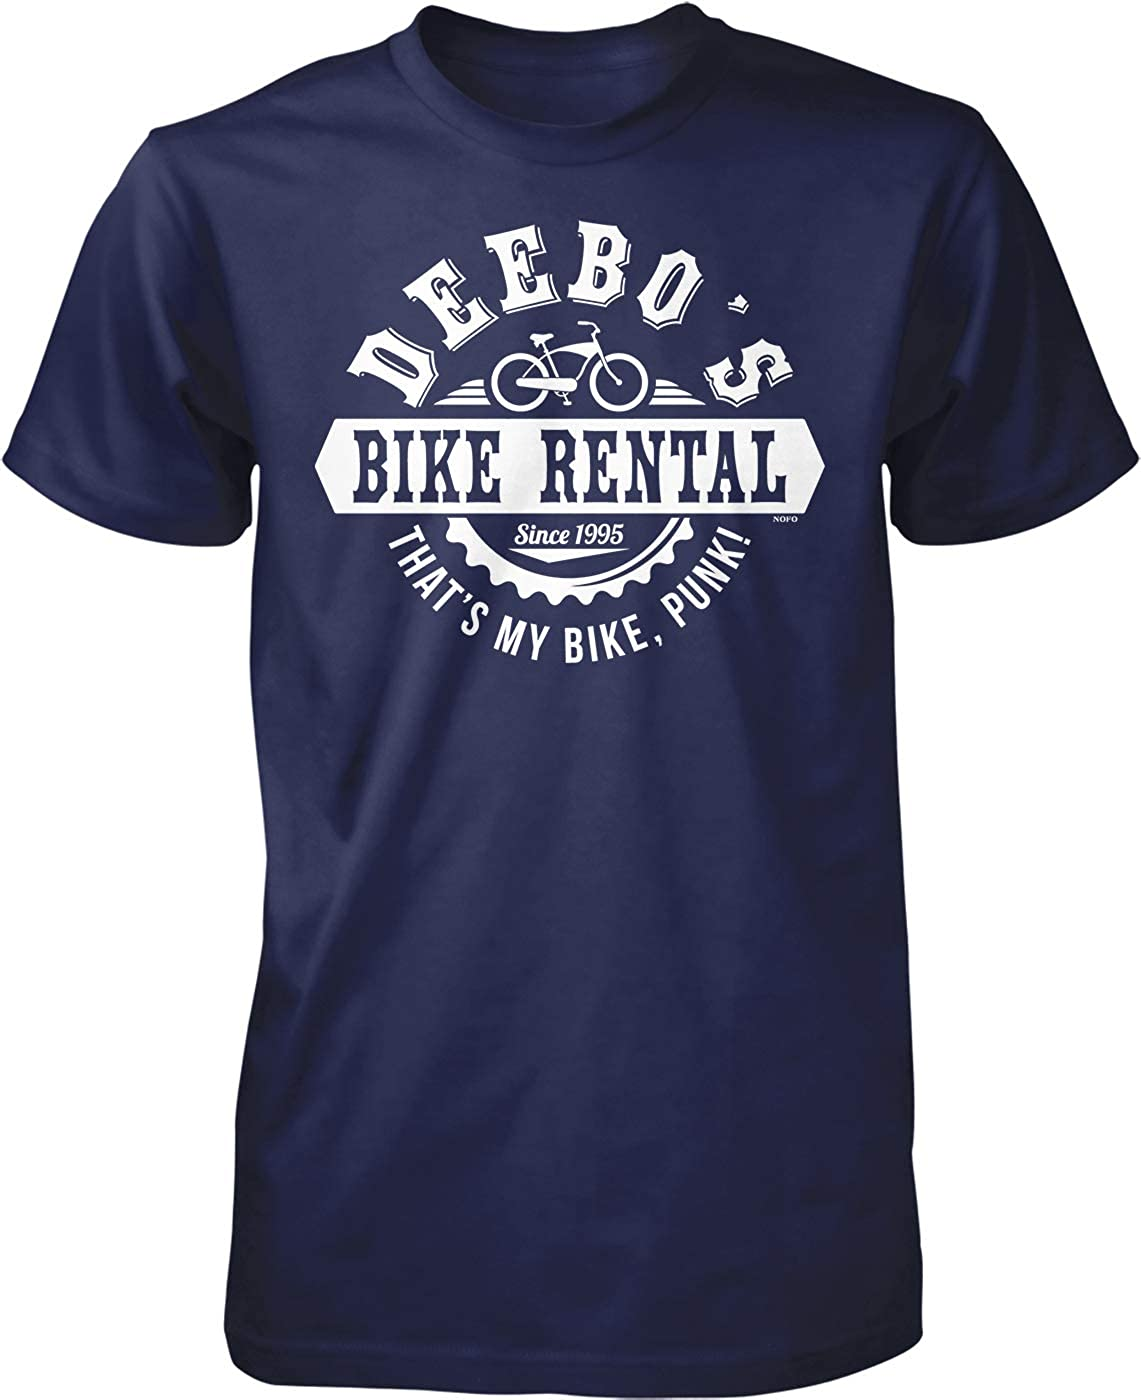 NOFO Clothing Co Deebo's Bike Rental, That's My Bike Punk Men's T-Shirt 61VNRqLcaTL